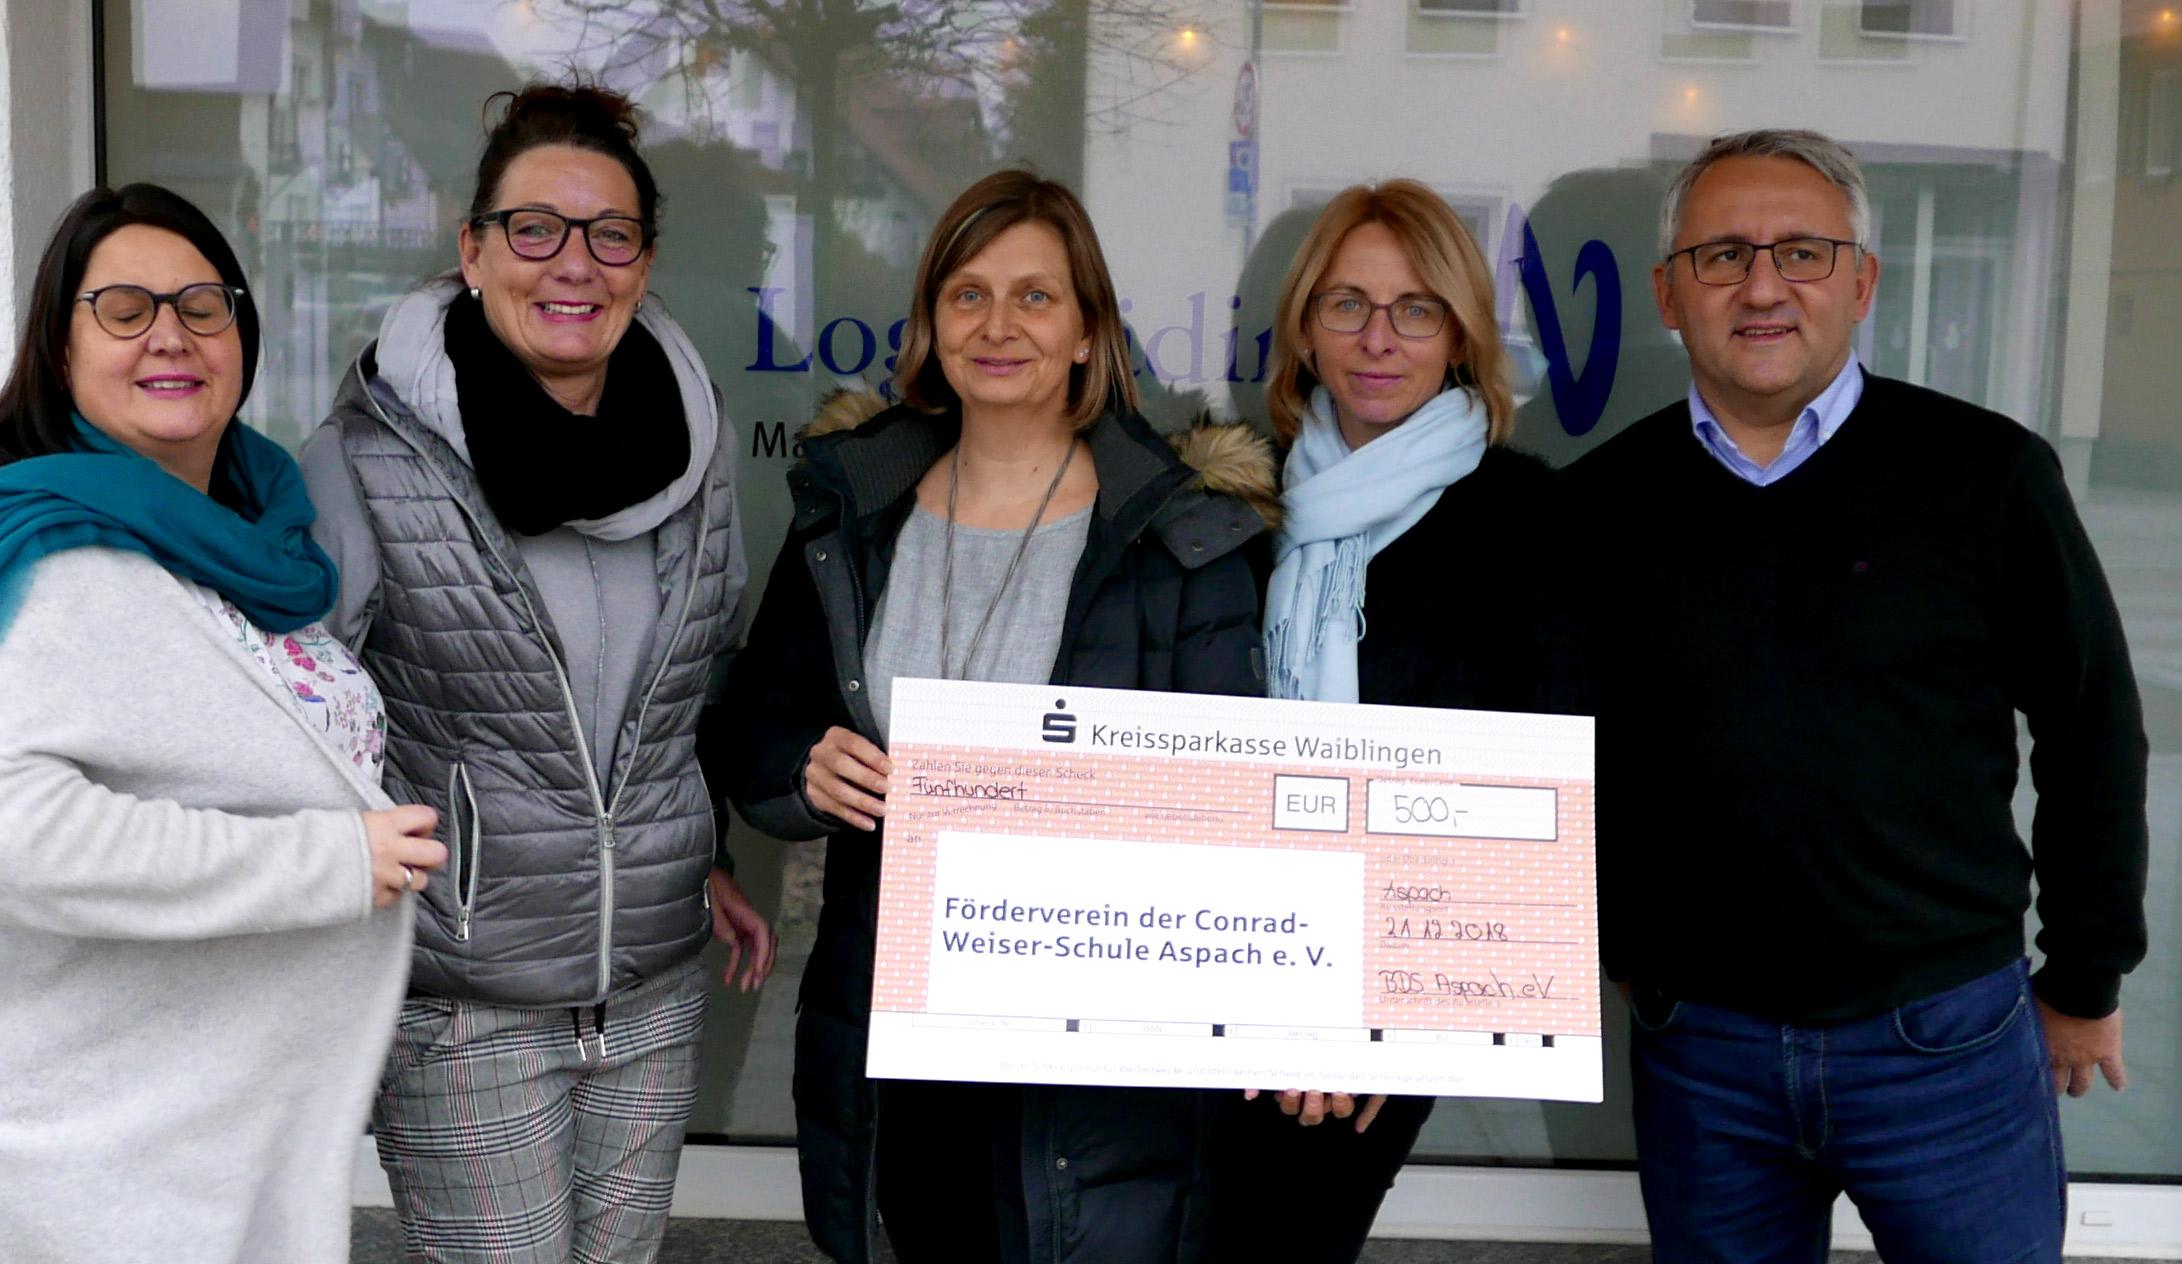 v.l.n.r. Manuela Gassmann-Habele, Monika Krail, Stefanie Gerling, Elke Lehr und Volker Benignus